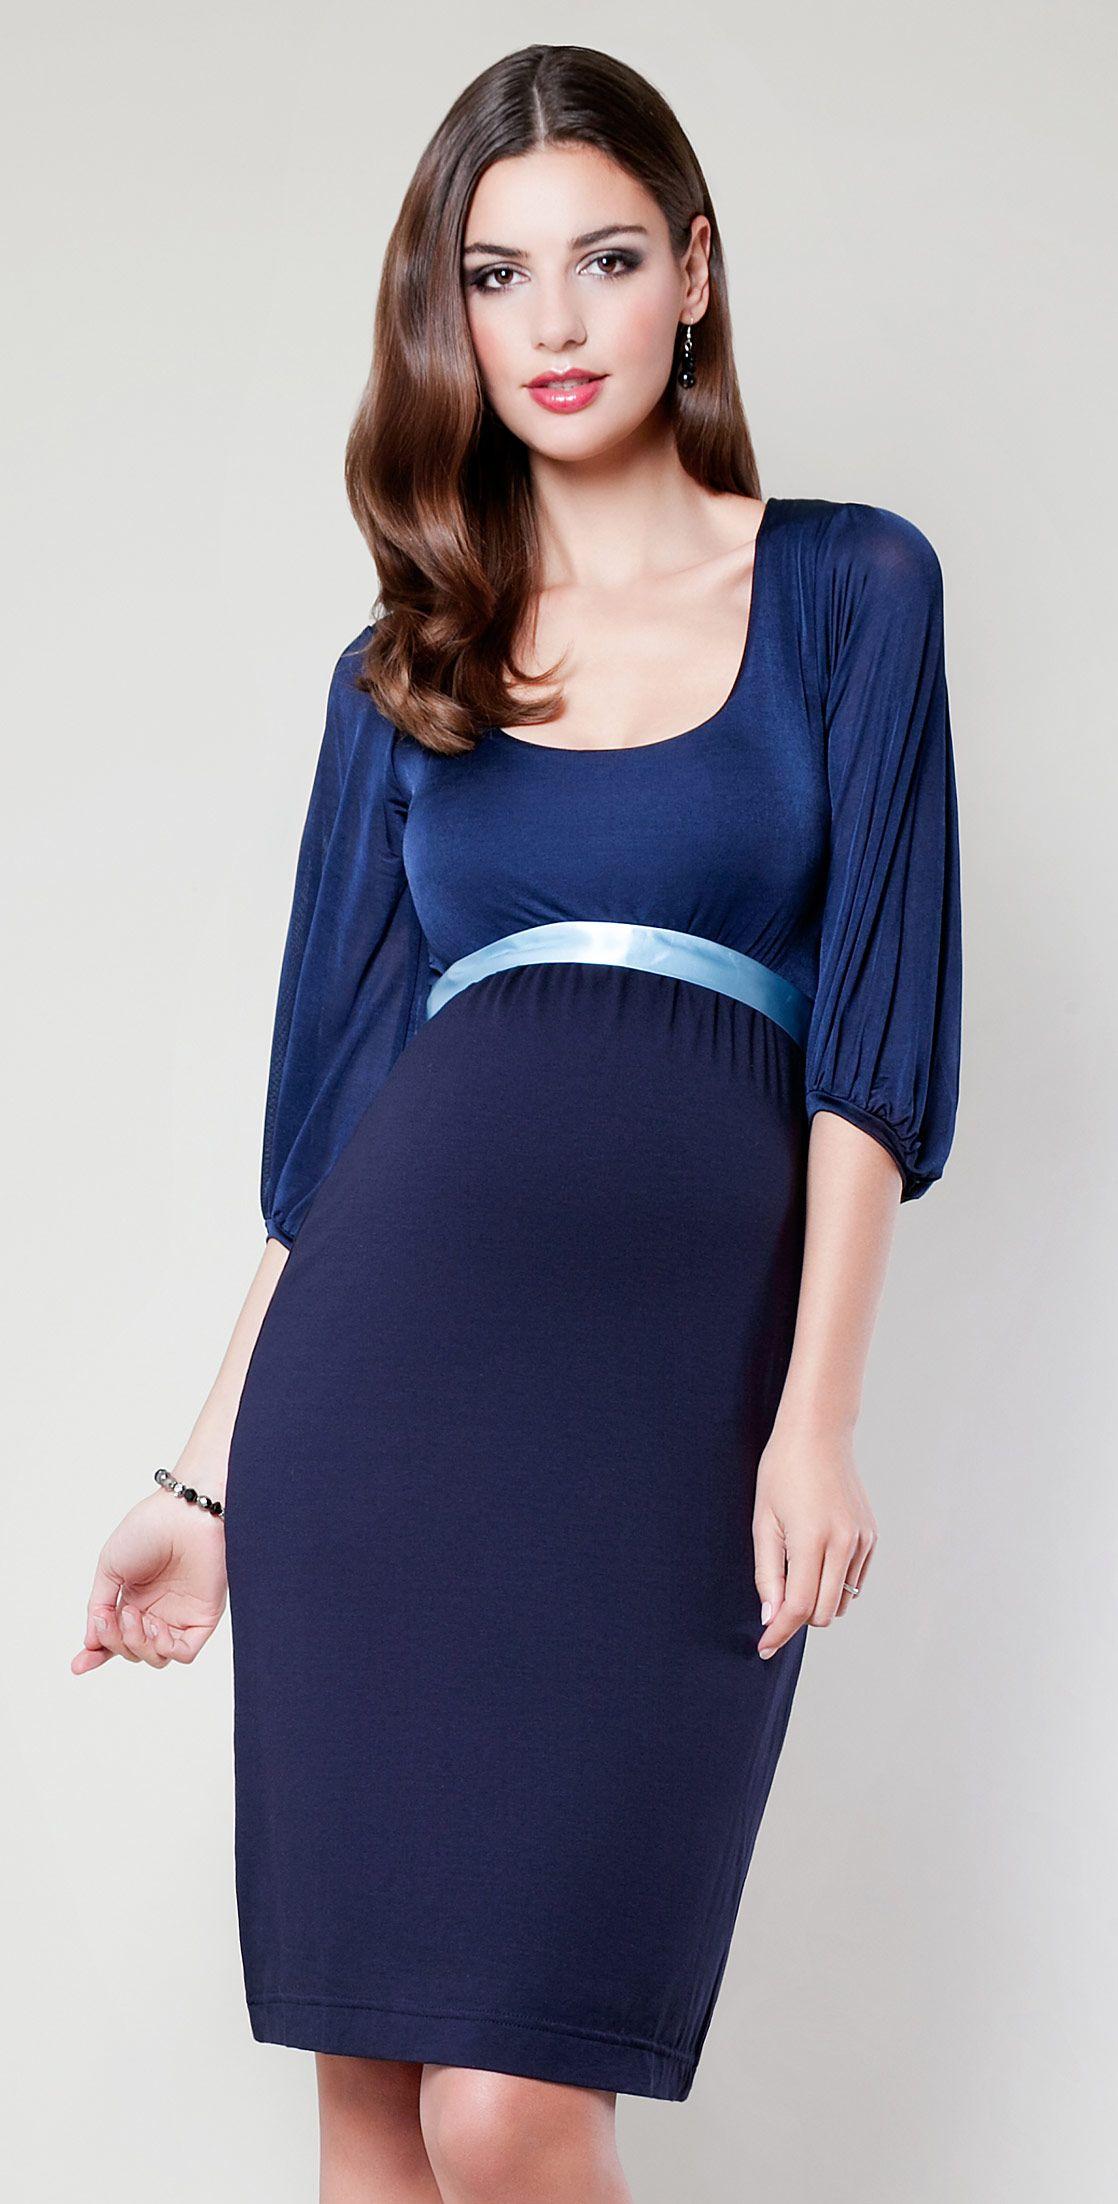 6871fe5a7728d Sienna Maternity Dress (Midnight Blue) by Tiffany Rose